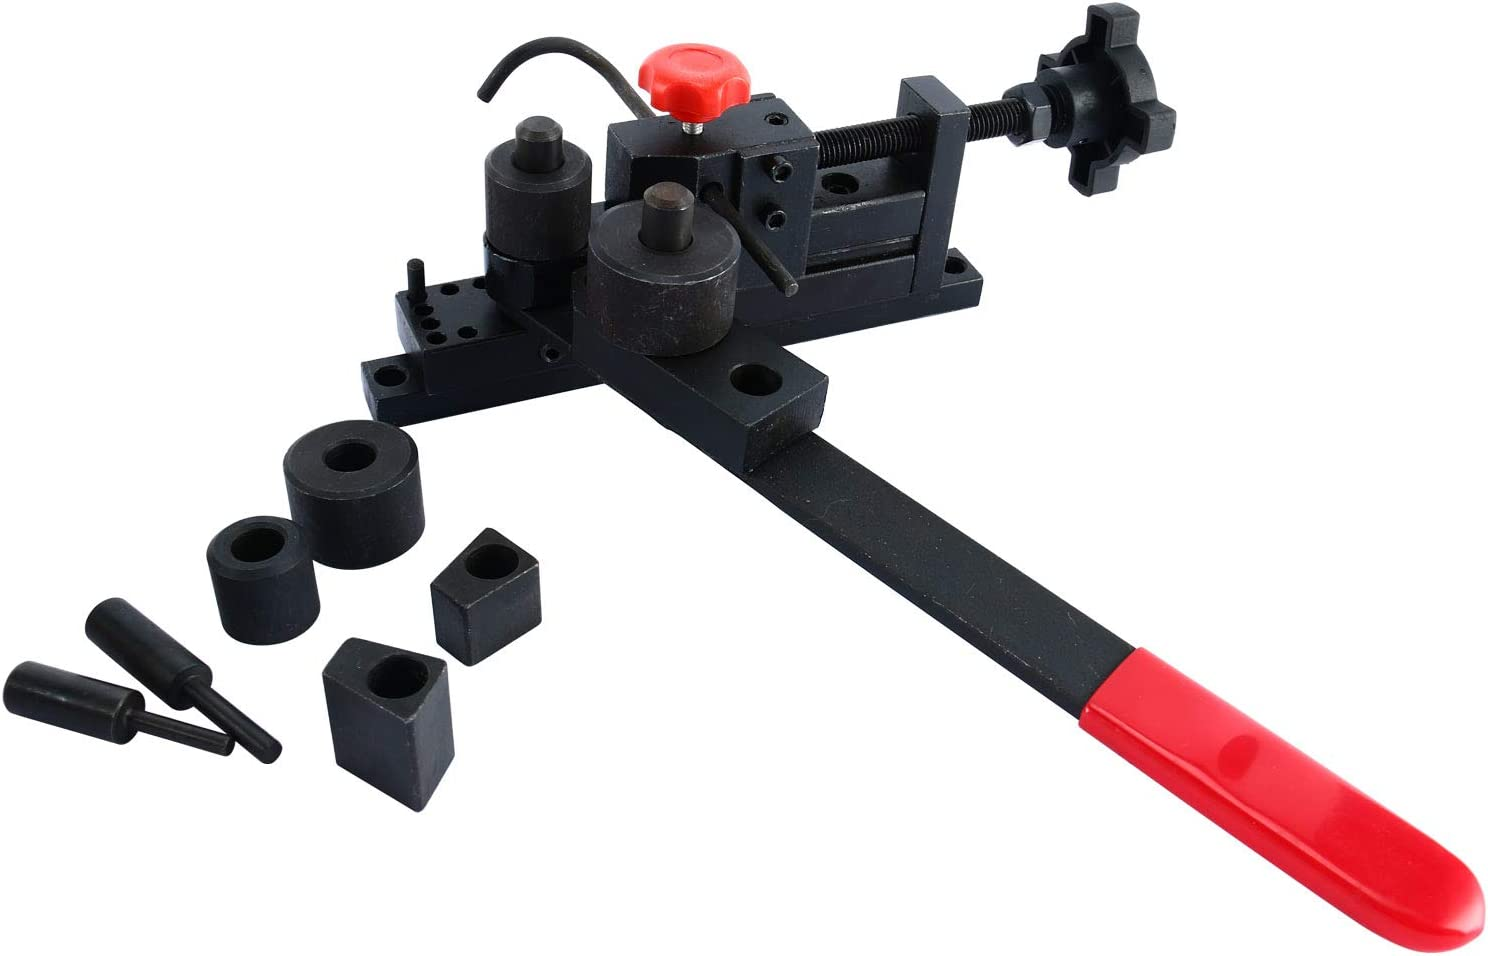 YaeTek Mini Universal Bending Bender Manual Mounting Bending Machine, Forms Wire Flat Metal Tubing Pipe Tube into Clamp Hook Brackets Coil Hardened Tool